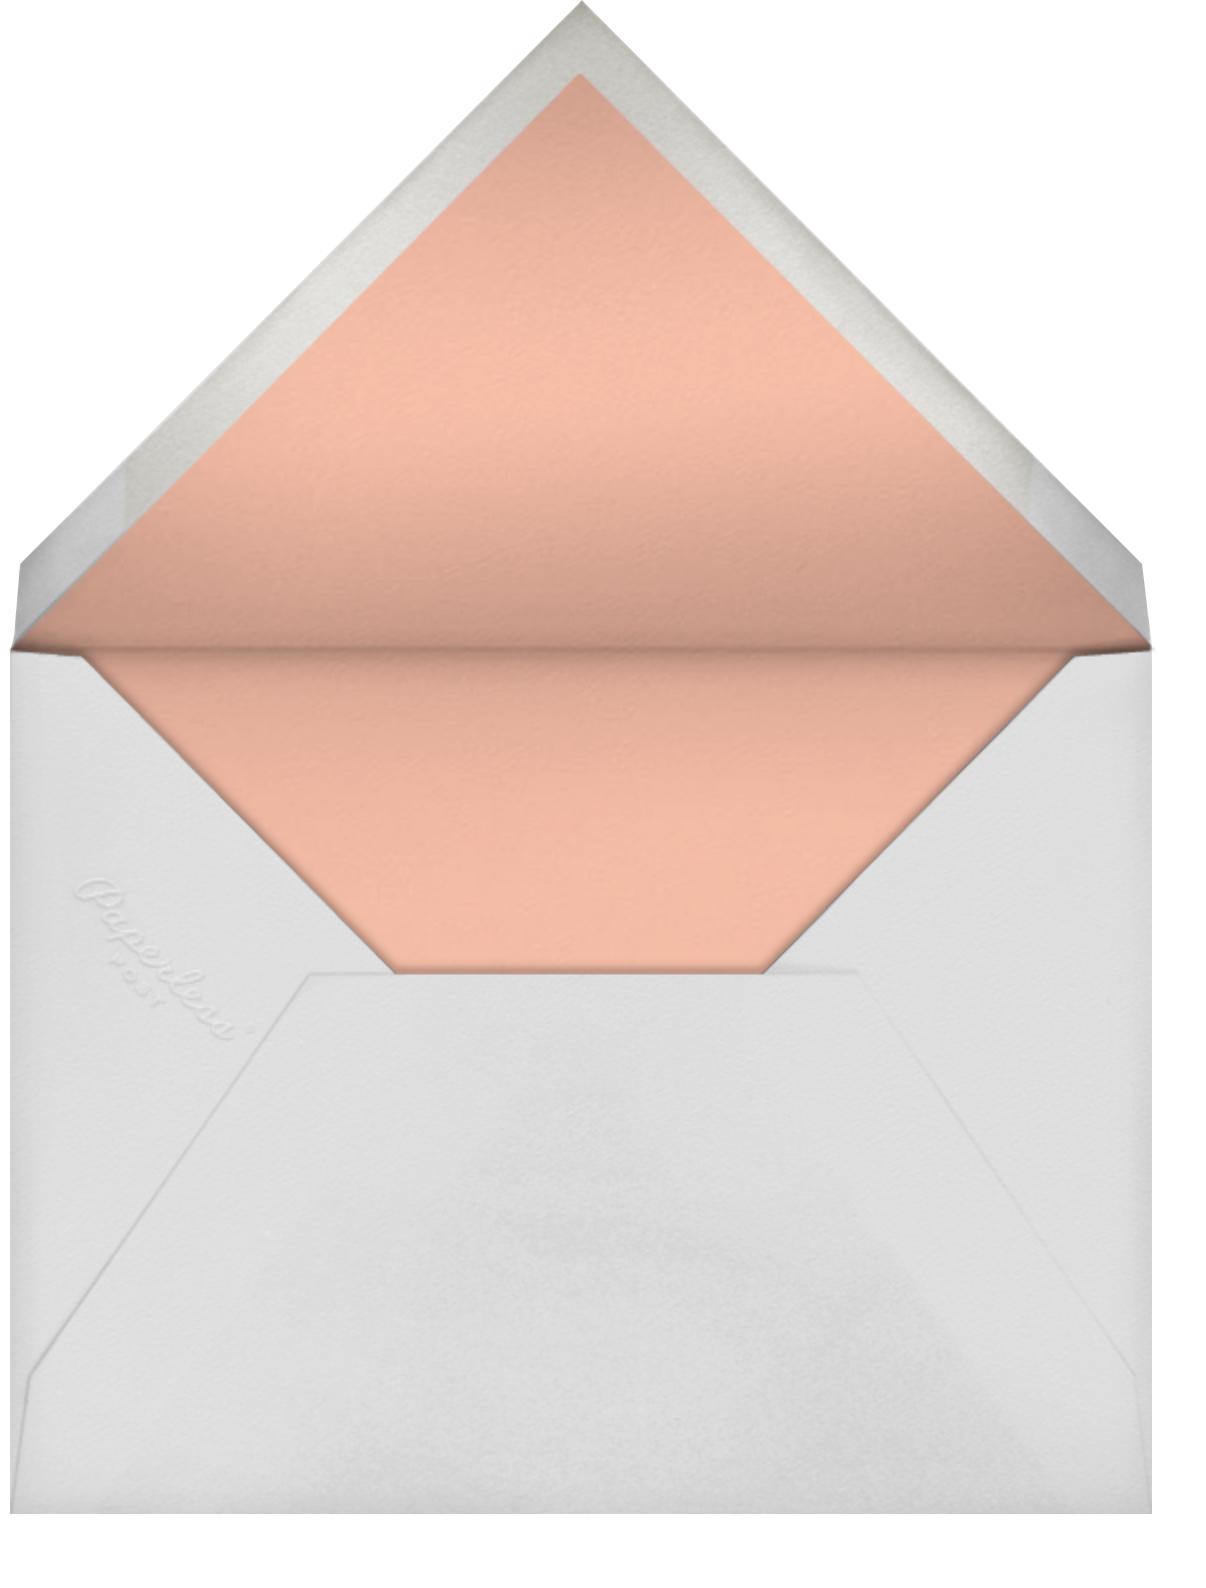 Chronicle (Invitation) - Paperless Post - All - envelope back